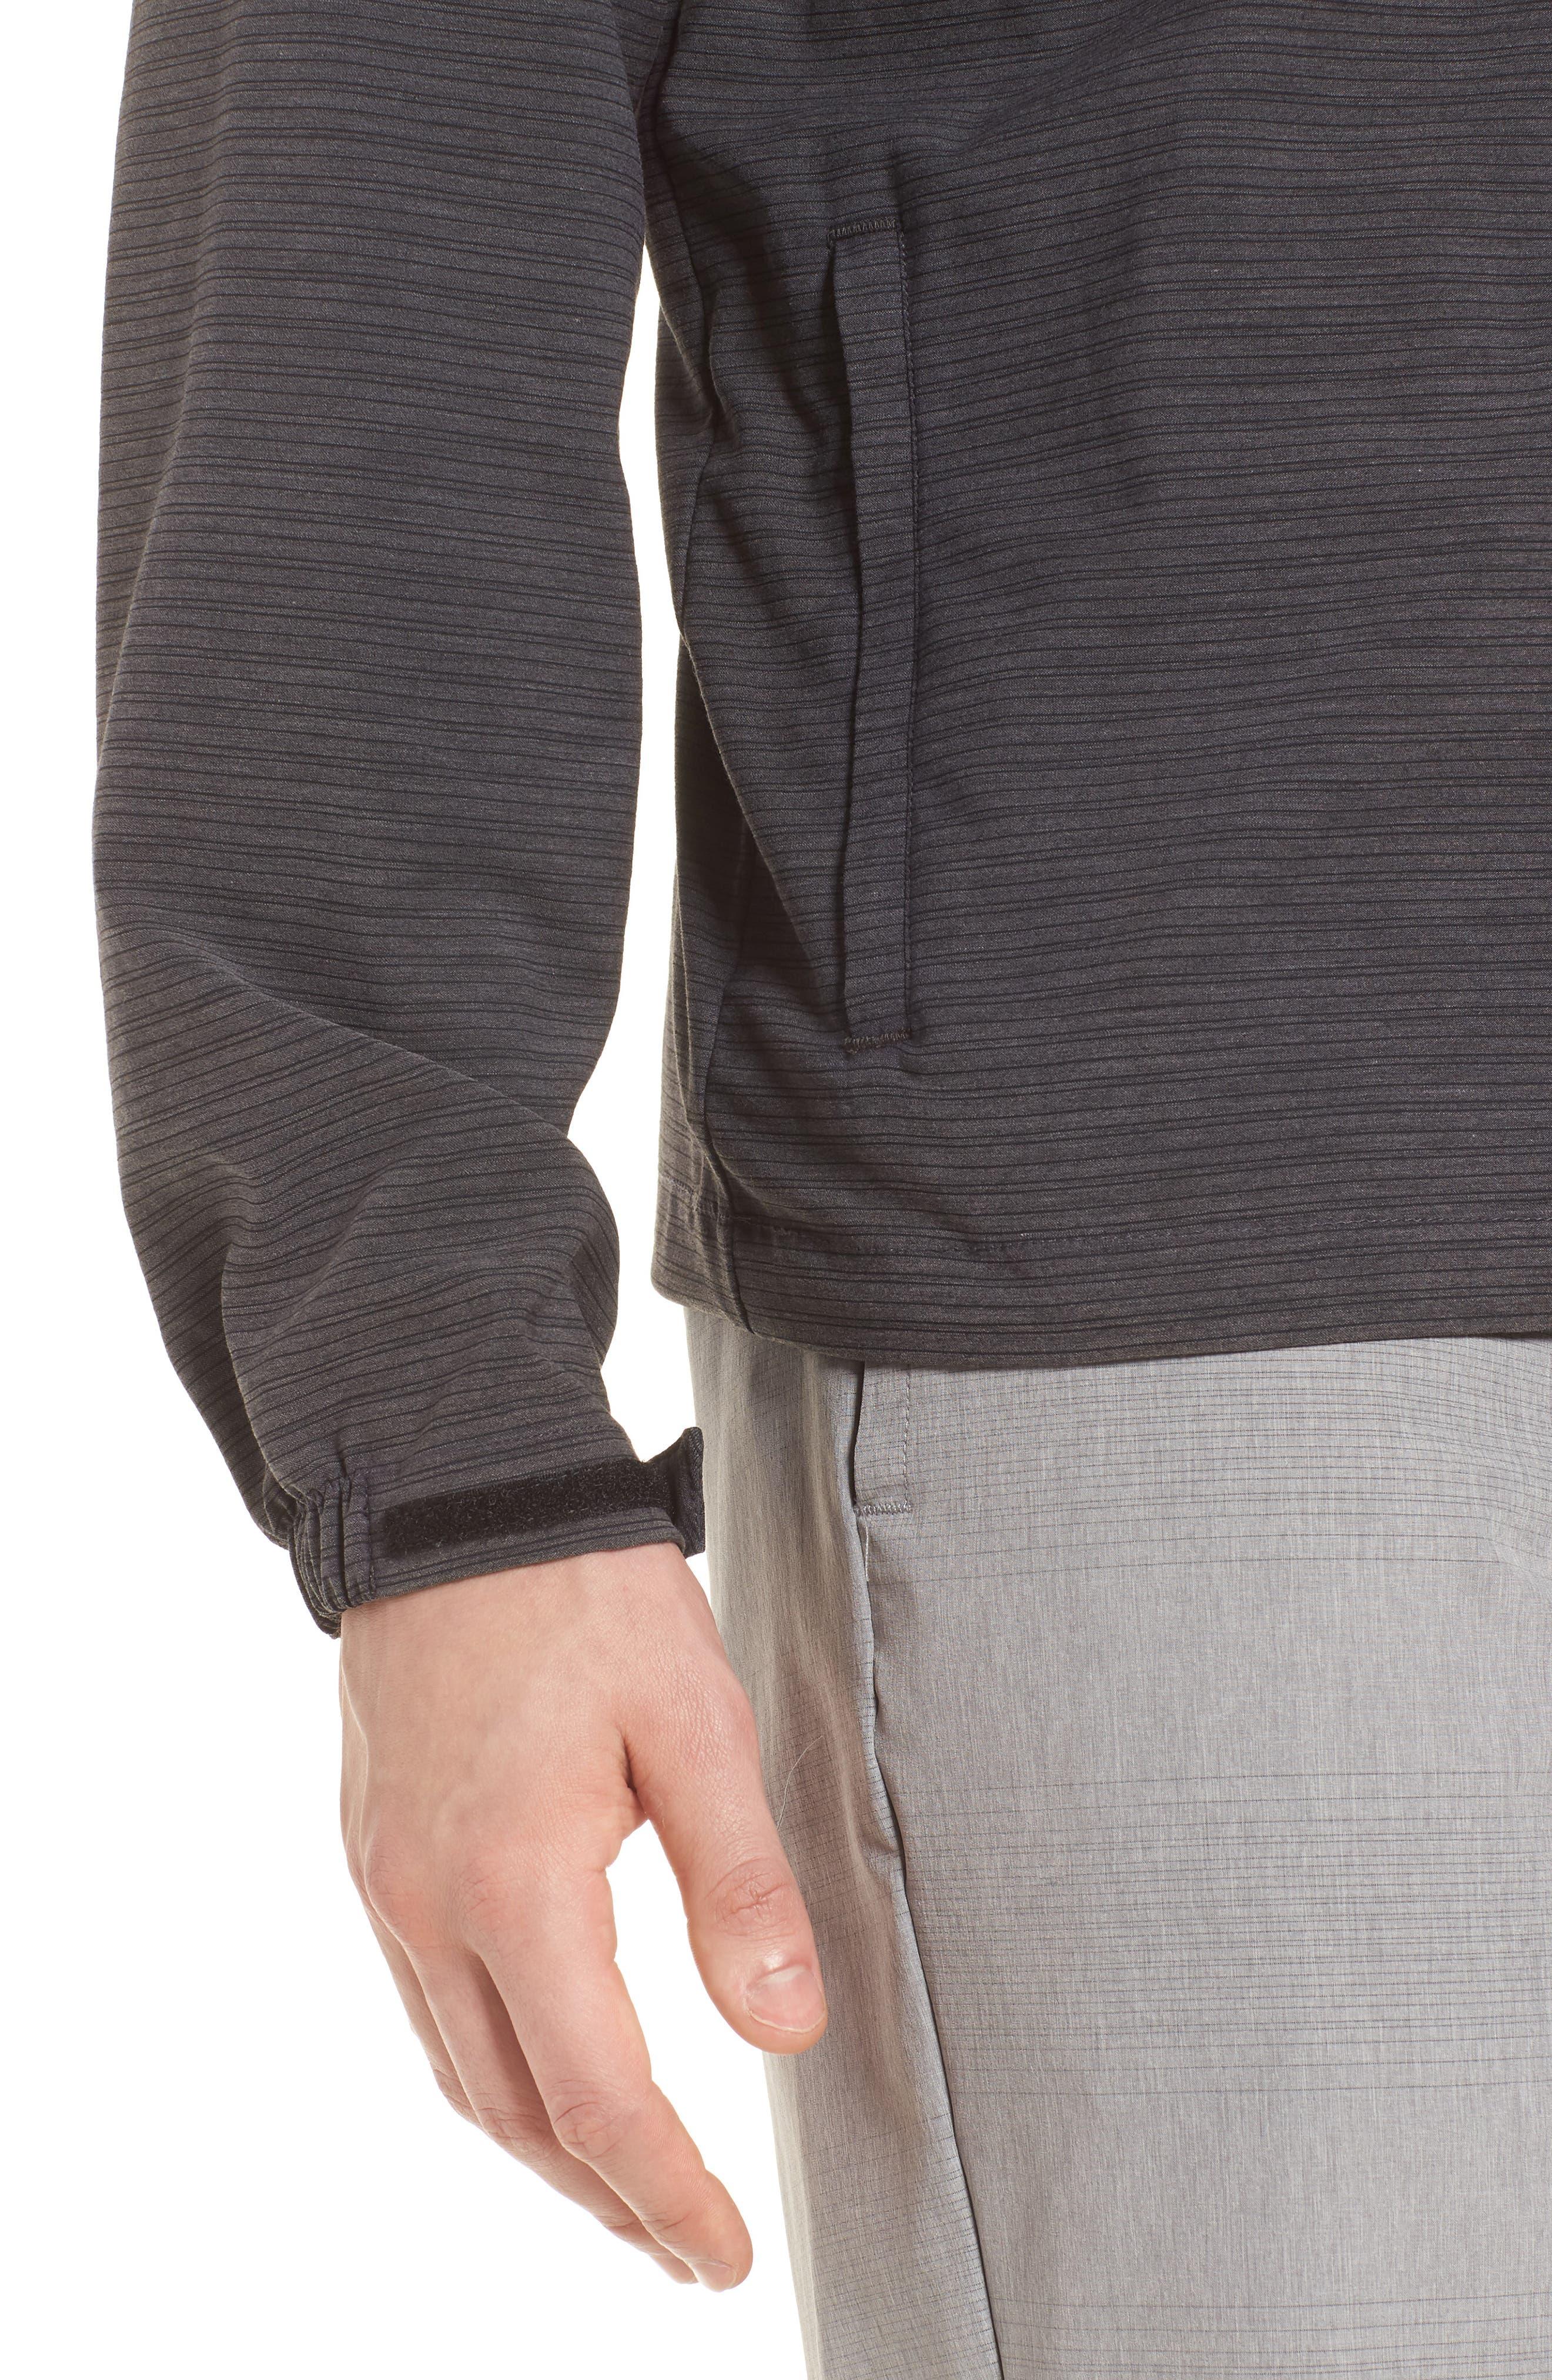 El Ganzo Zip Jacket,                             Alternate thumbnail 4, color,